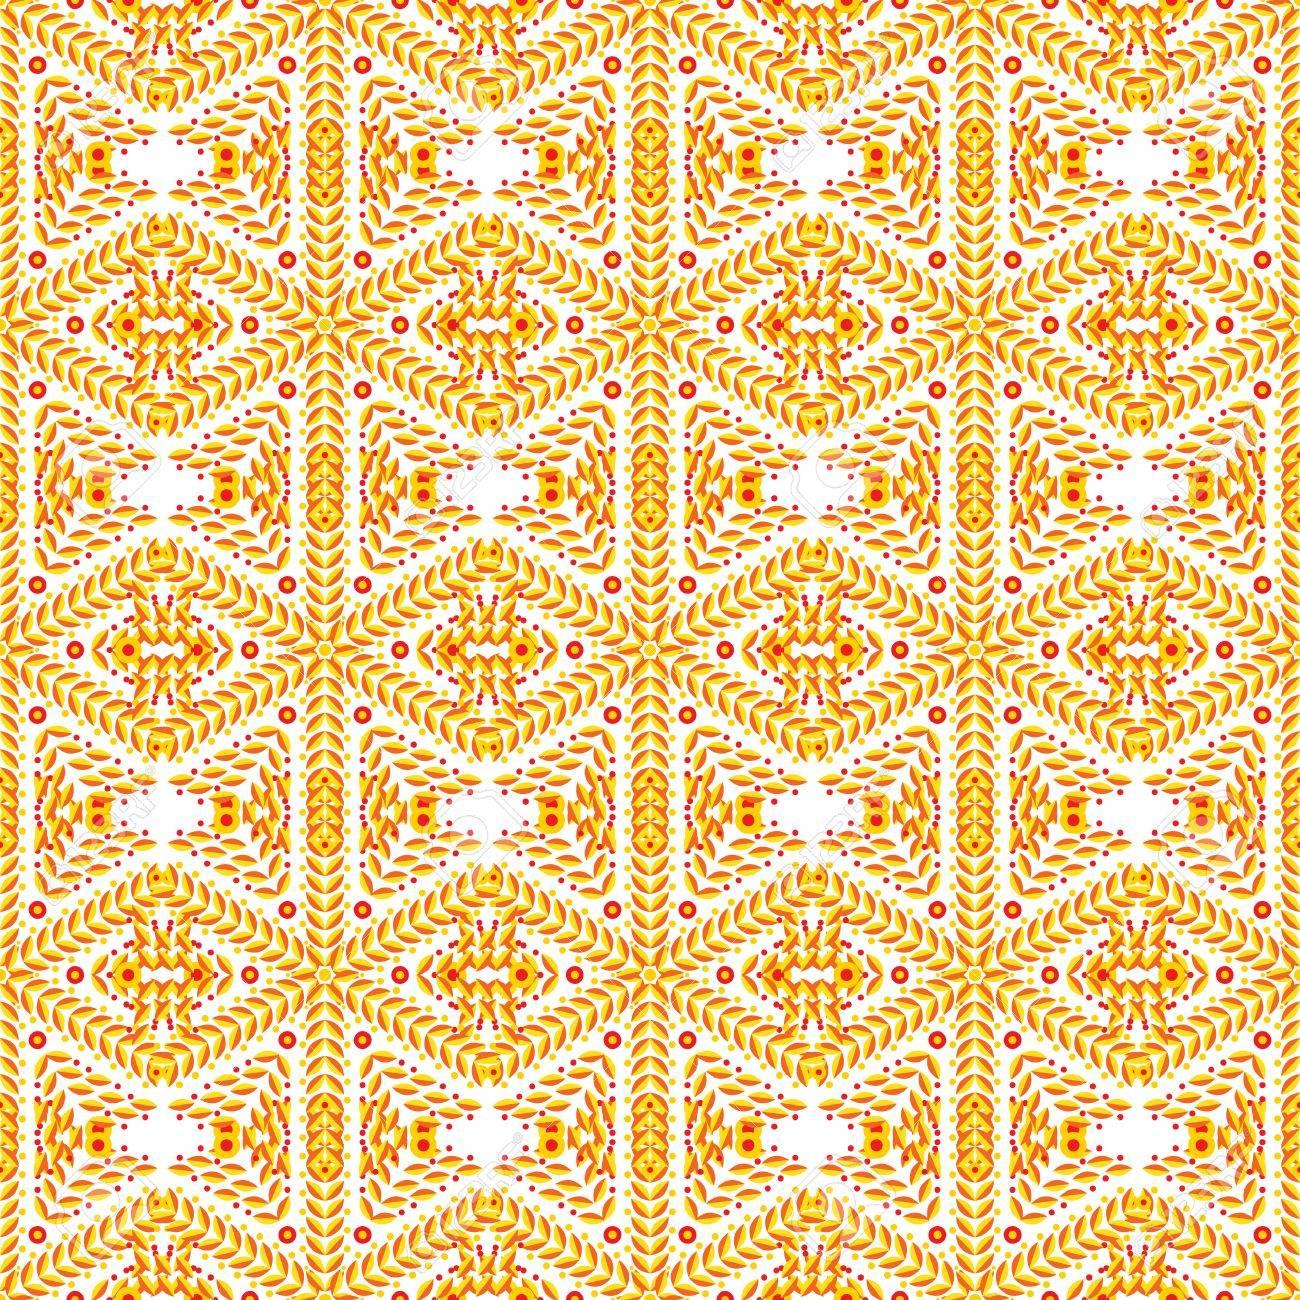 48322304 orange luxury background art deco for background wallpaper scrapbooking prints